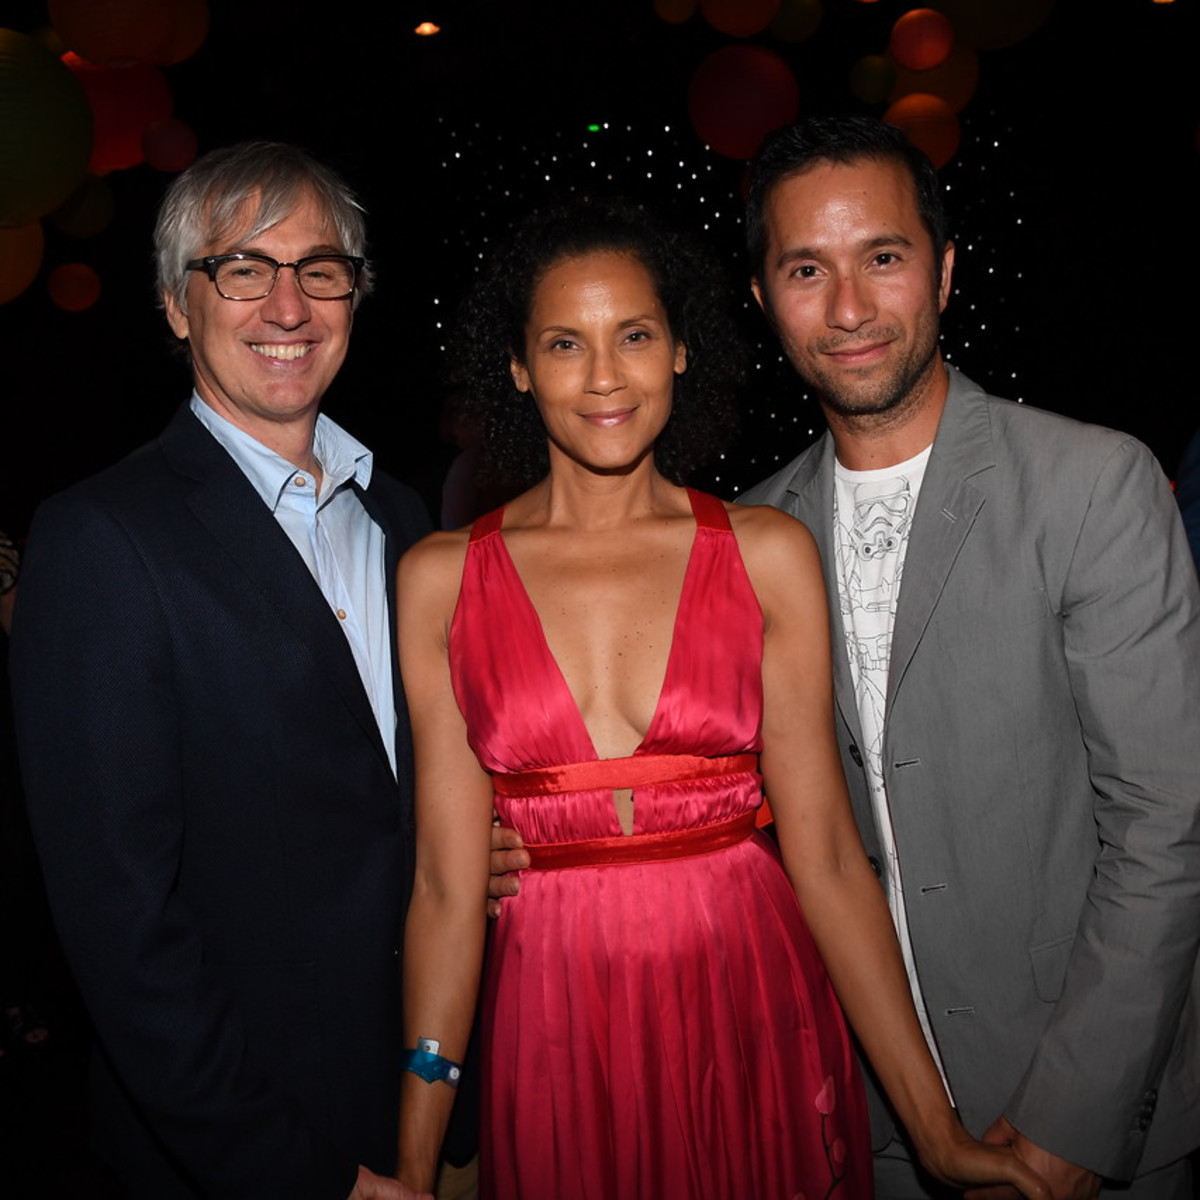 Stephan Wolfert, Dawn Stern, Carman Lacivita